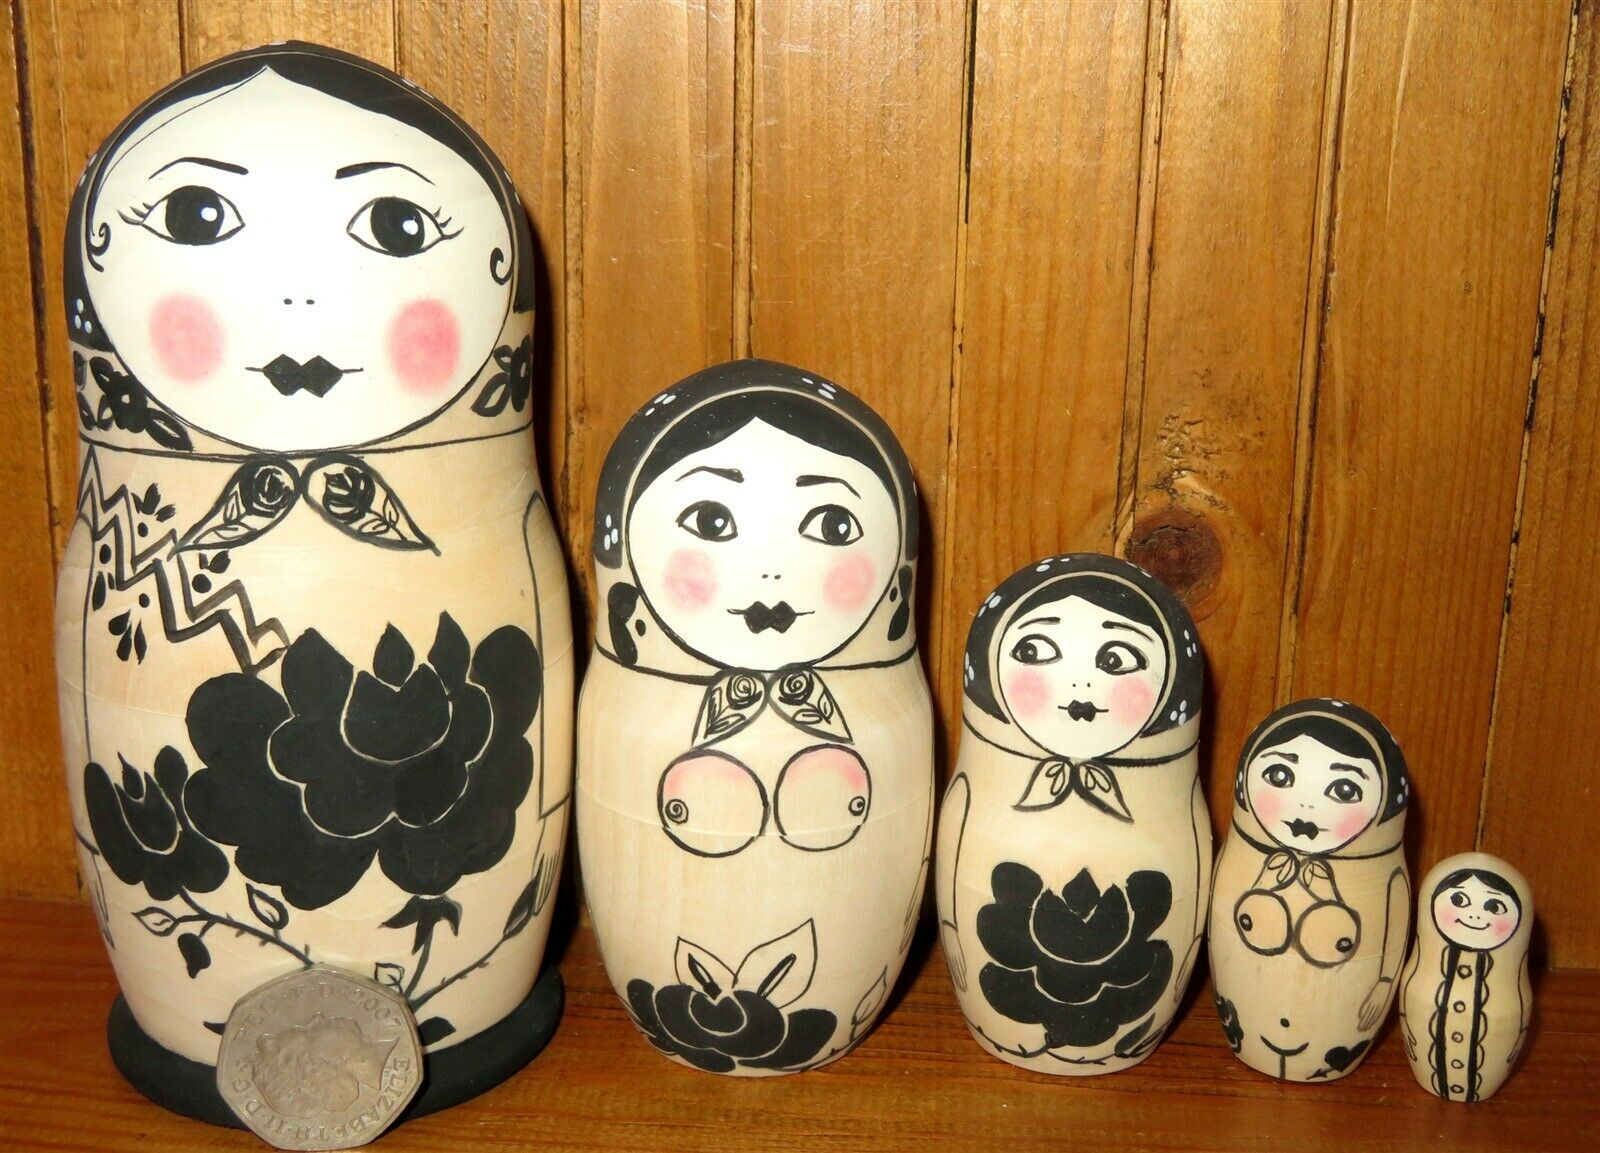 Exotic Dancer Striptease Funky Kitsch Russian nesting dolls 5 UNIQUE Matryoshka